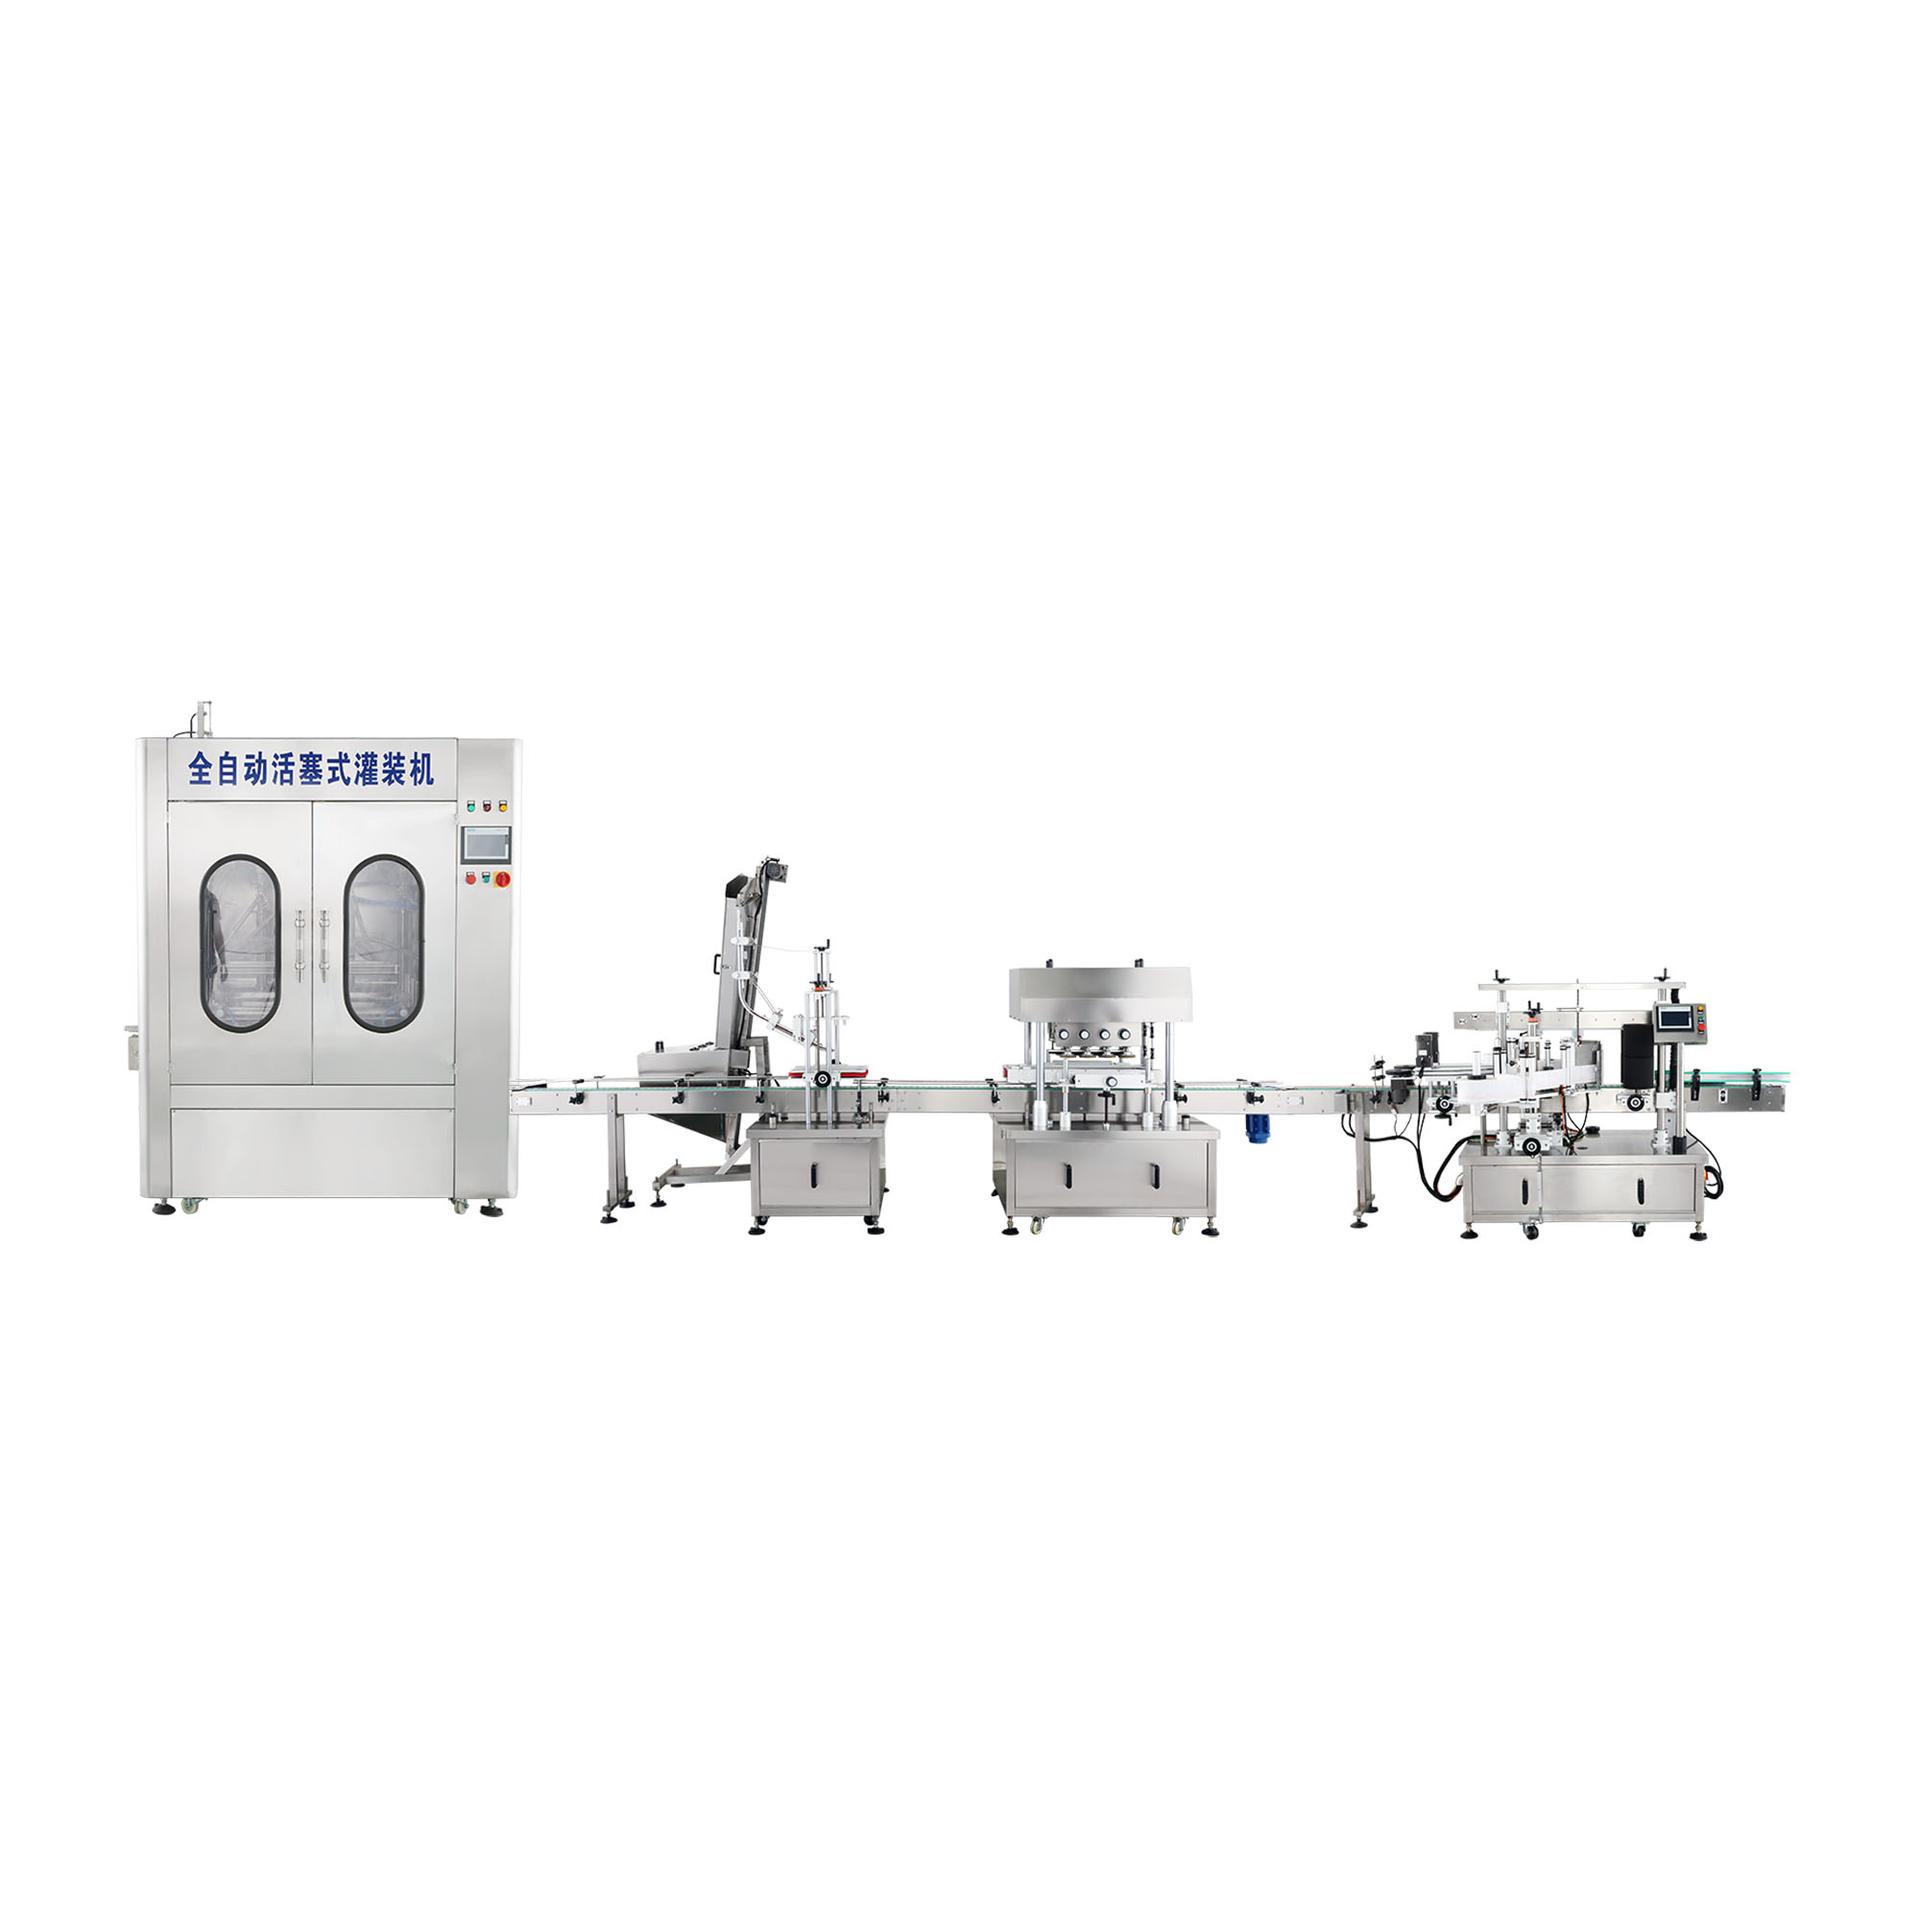 The shampoo shower gel filling production line